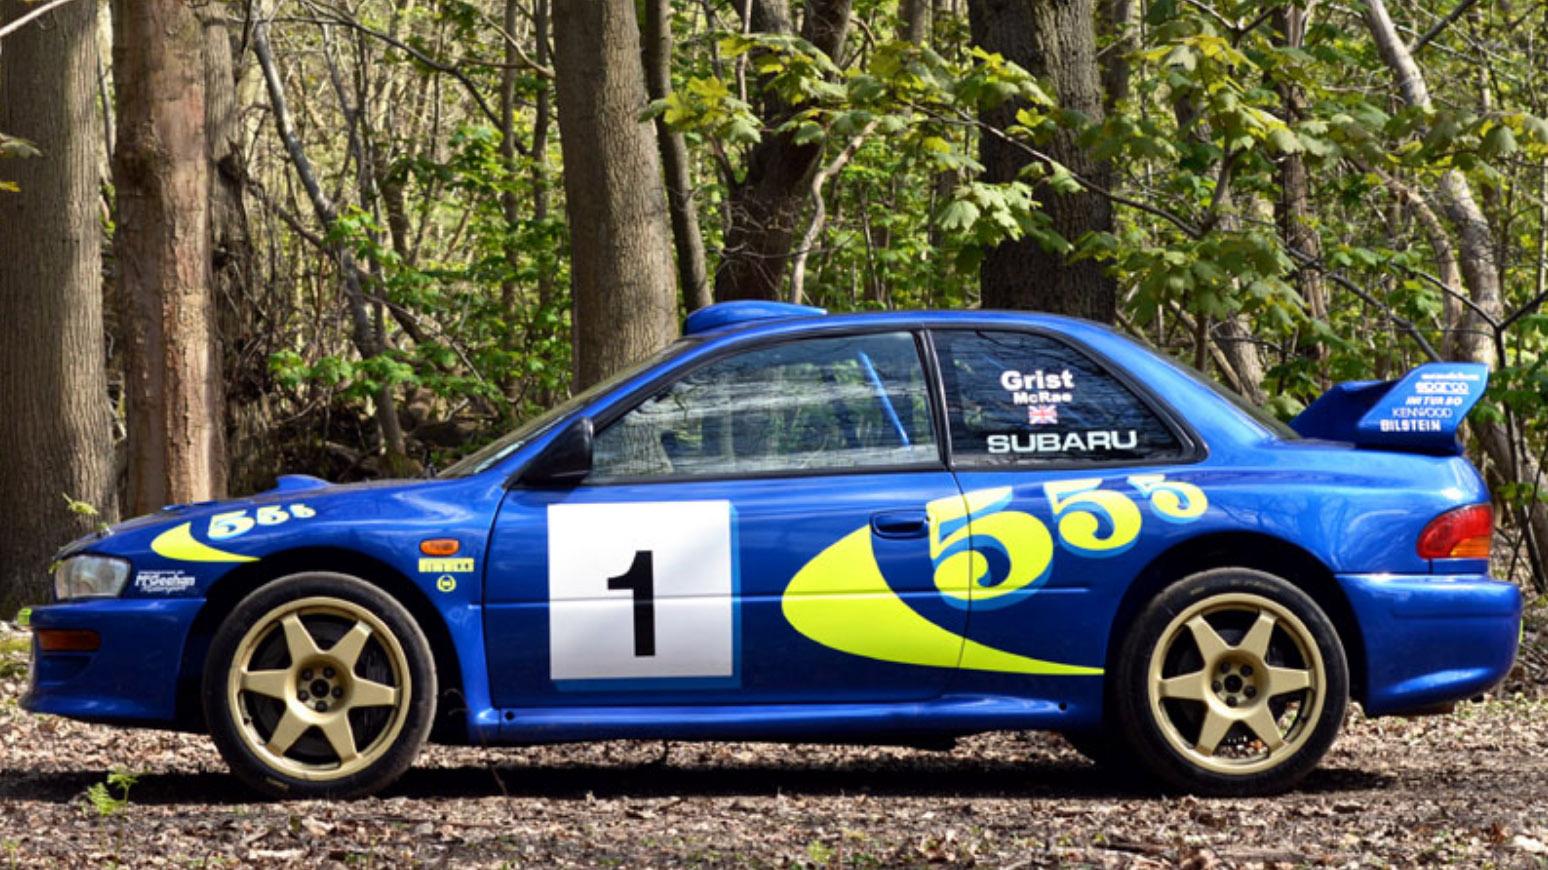 Subaru Impreza Colin Mcrae 001 side